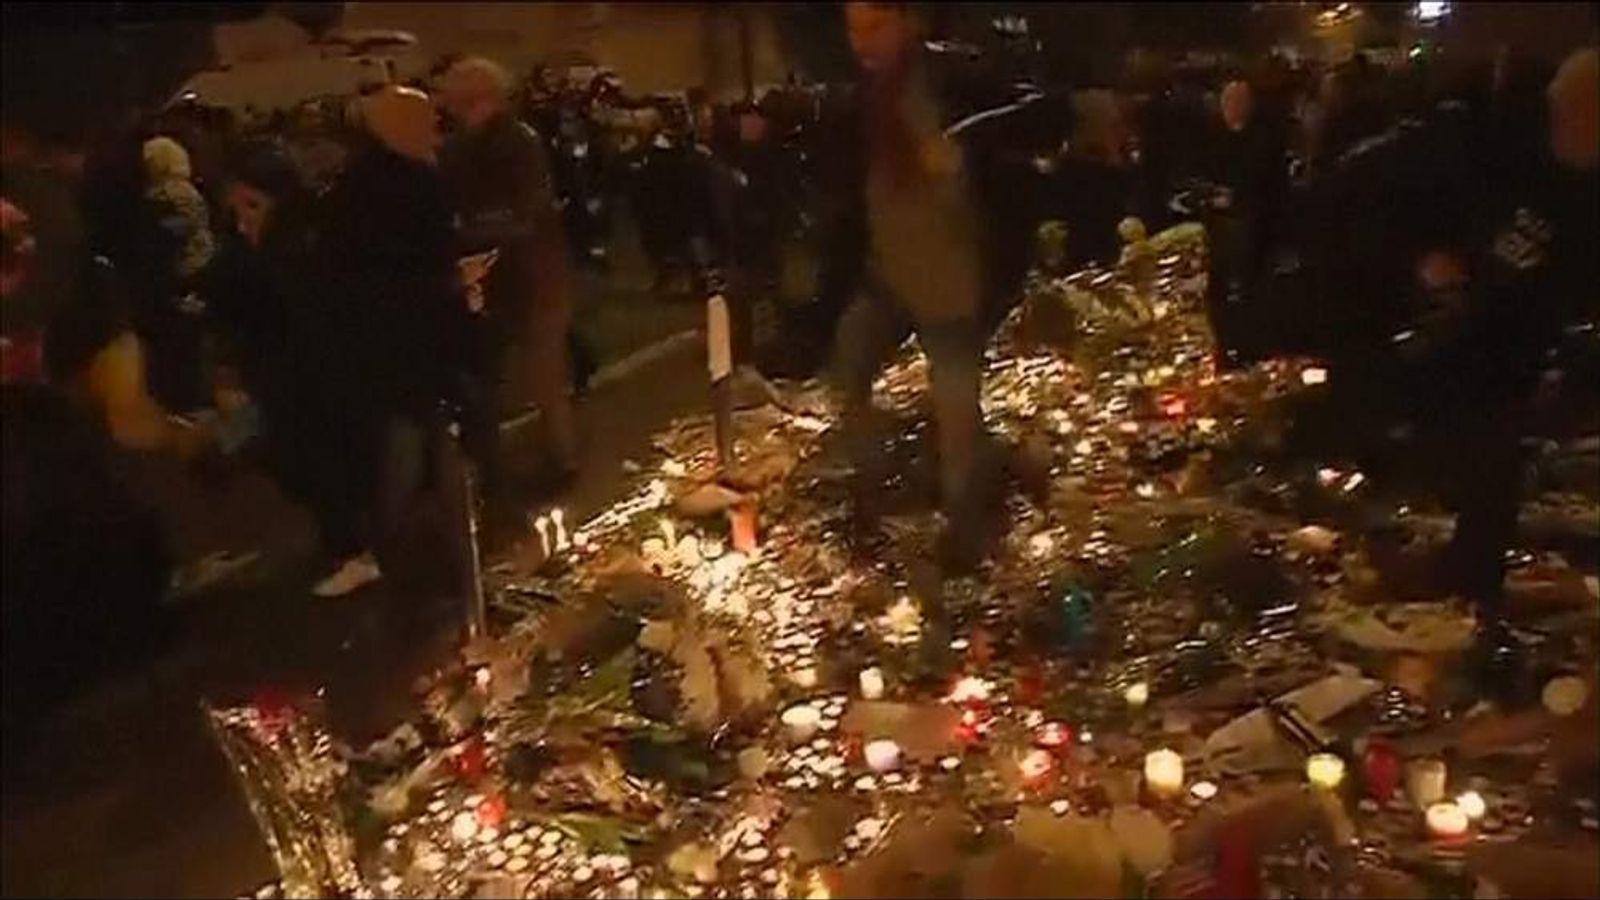 People panic after hearing screams near the Place de Republique in Paris